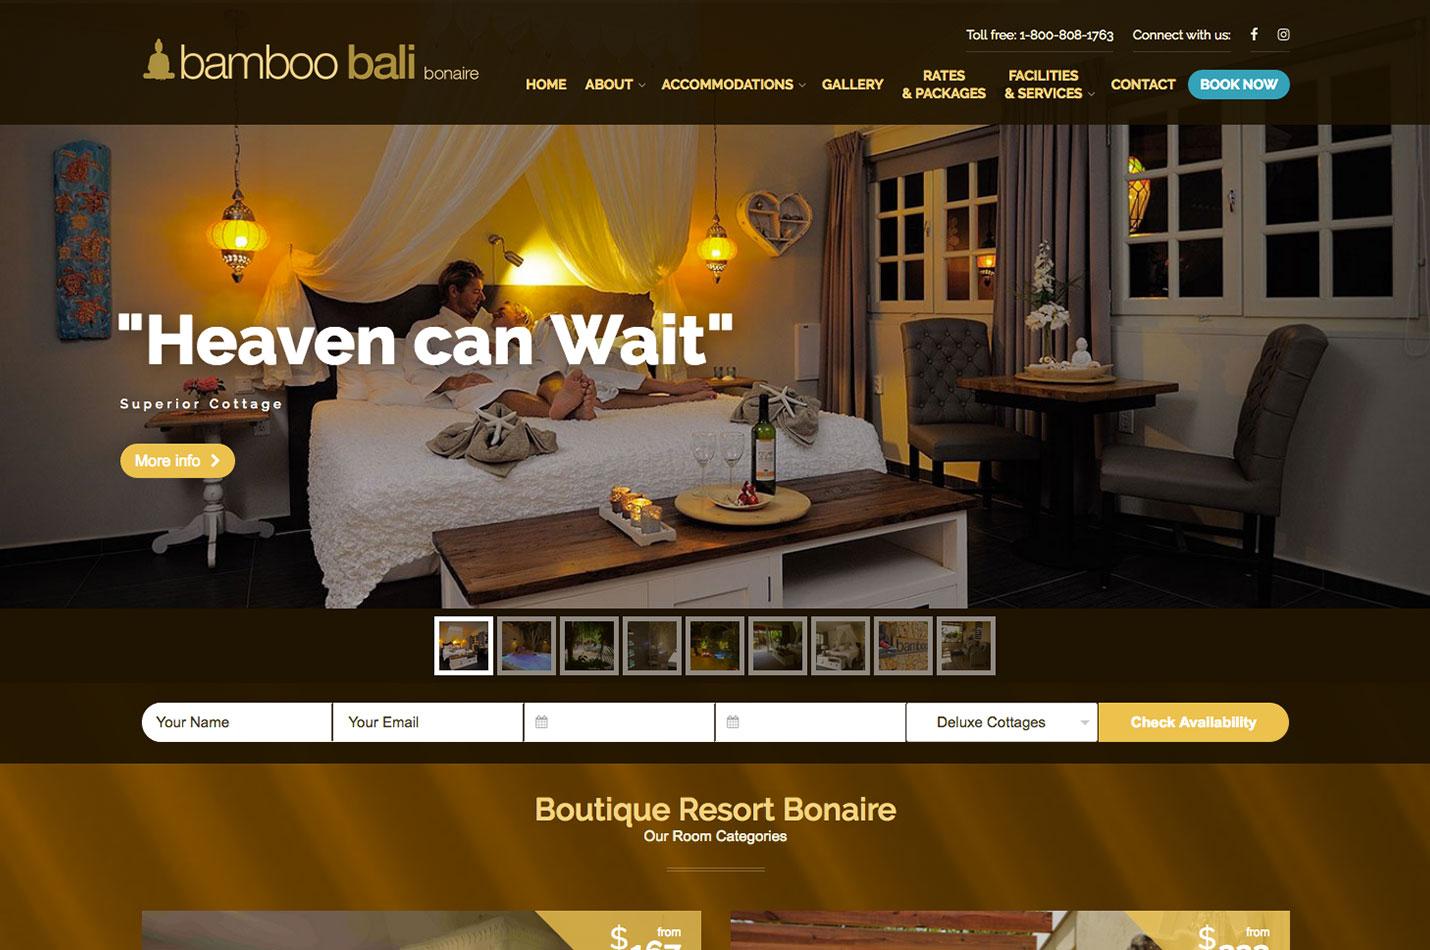 bamboo-bali bonaire website design